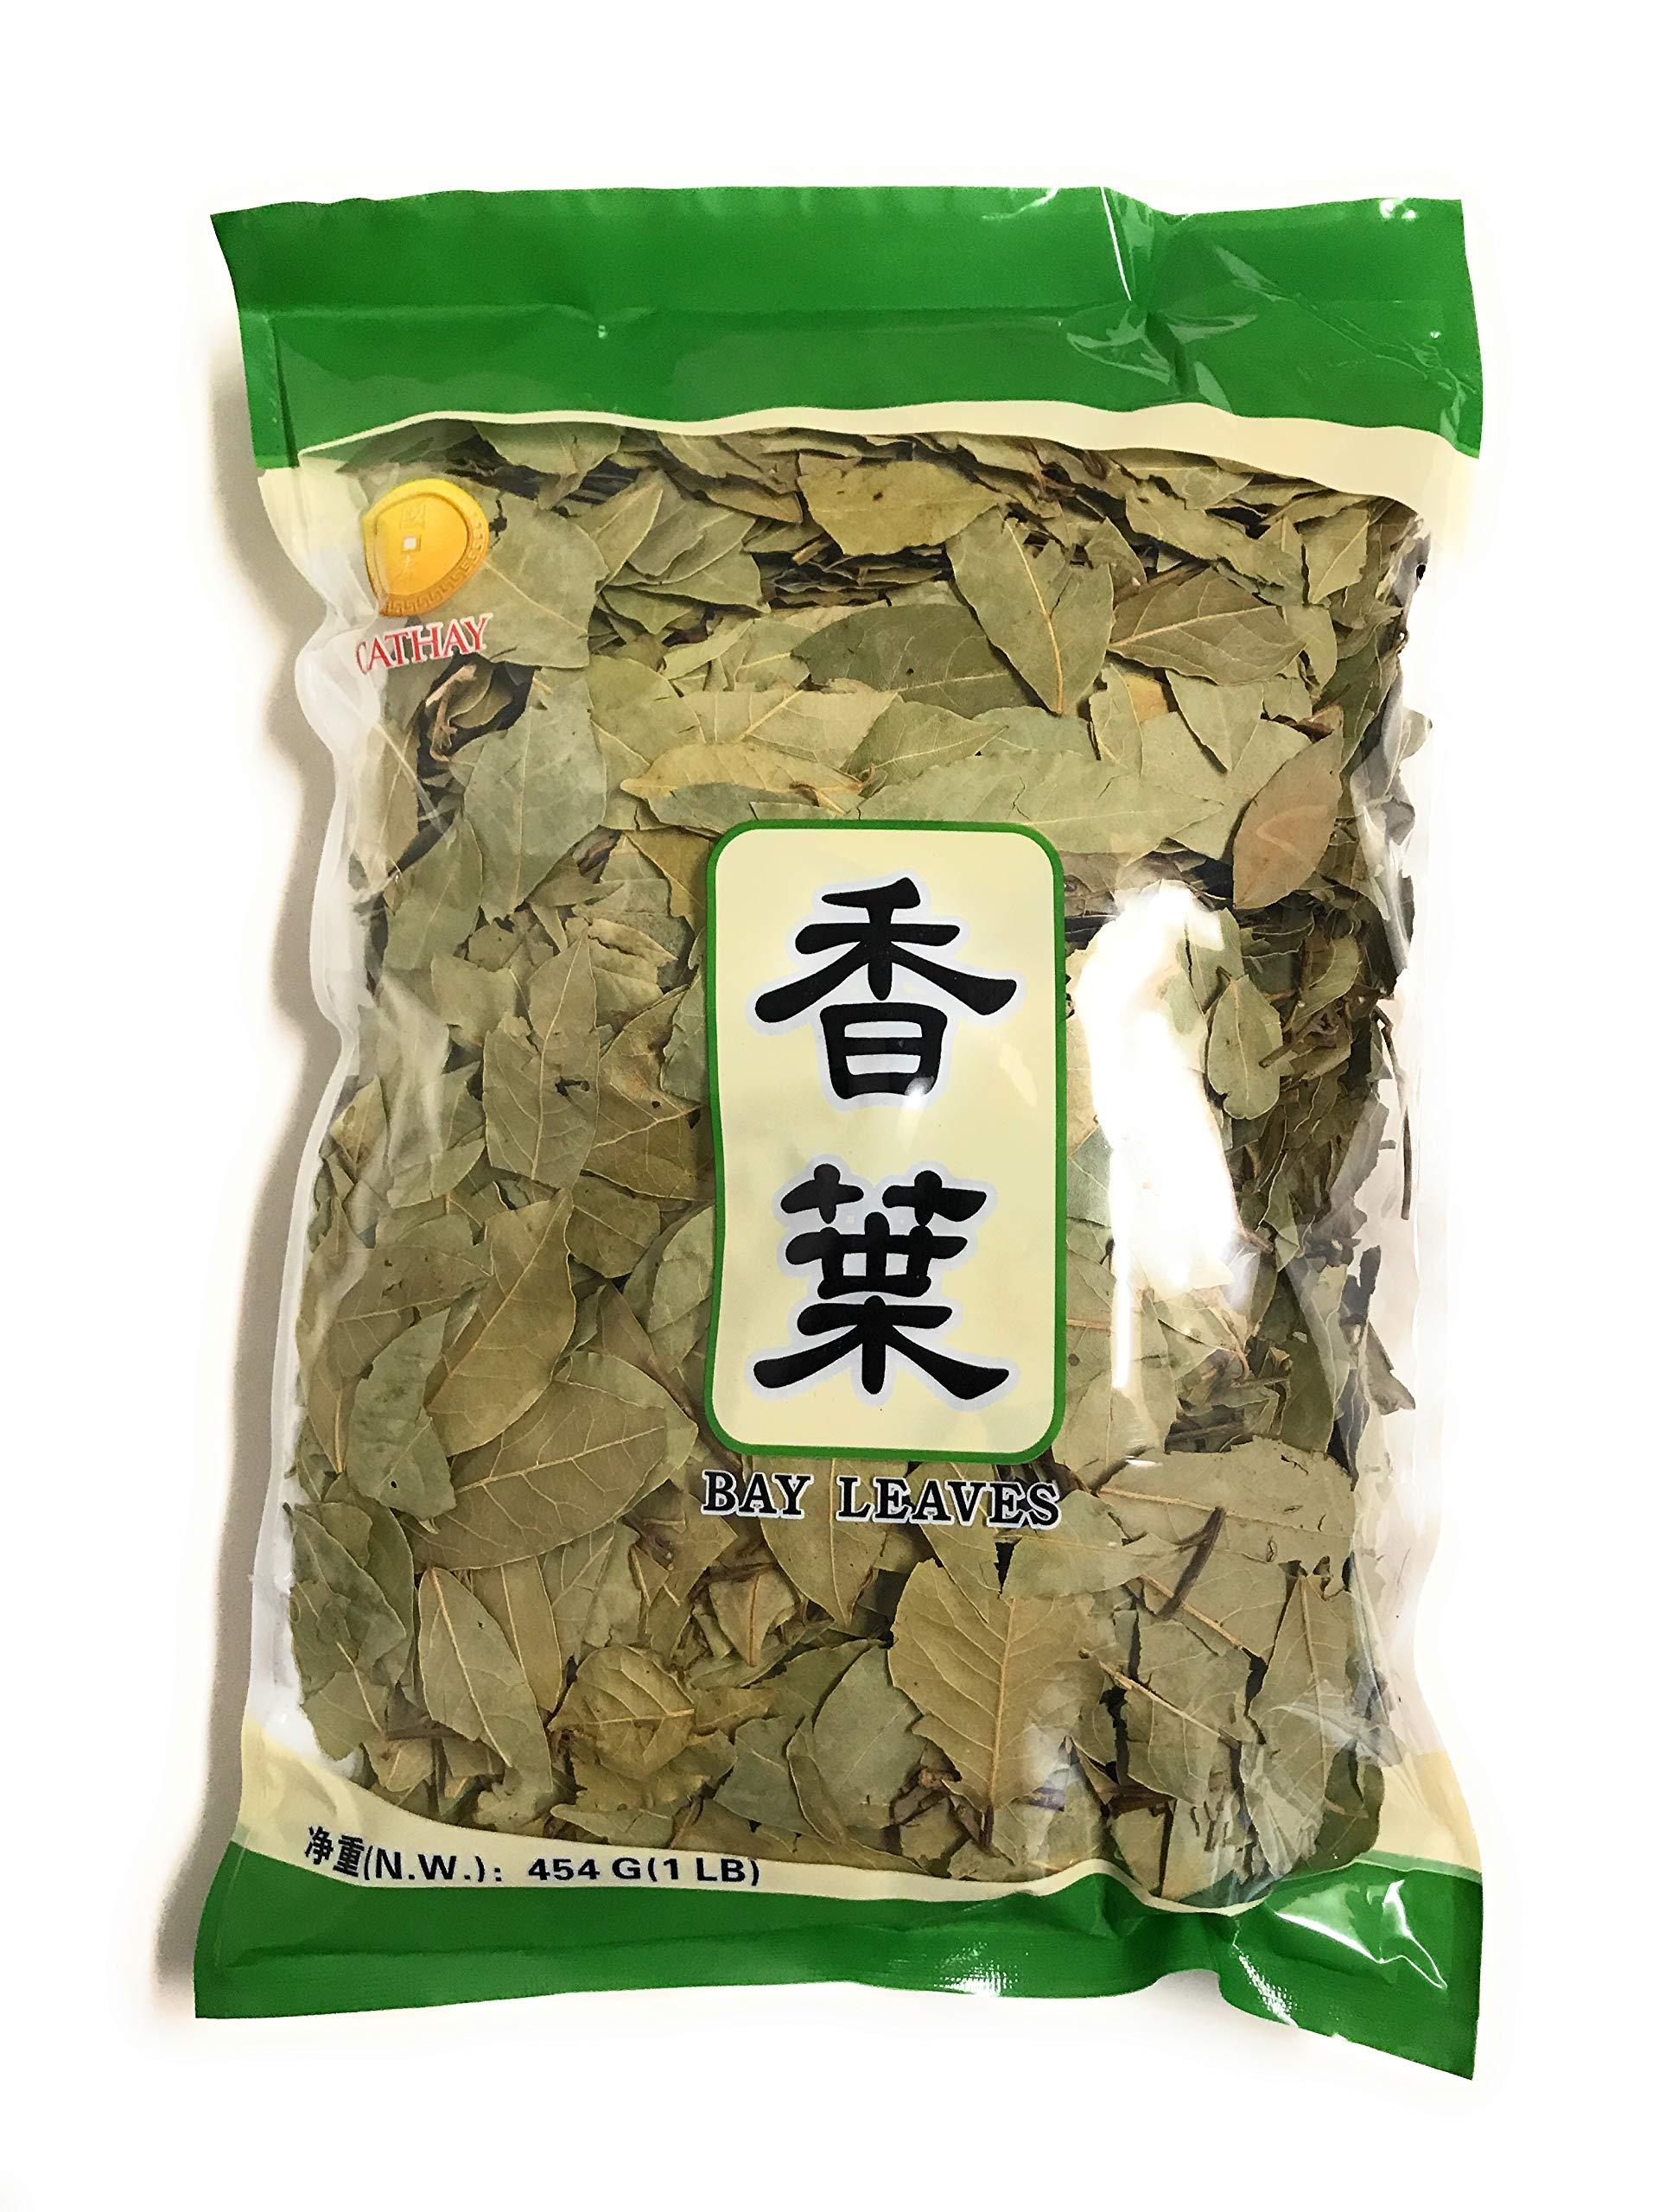 Bay Leaves Dried, Whole, 1 Pound (454g) Bulk Bag By TLA